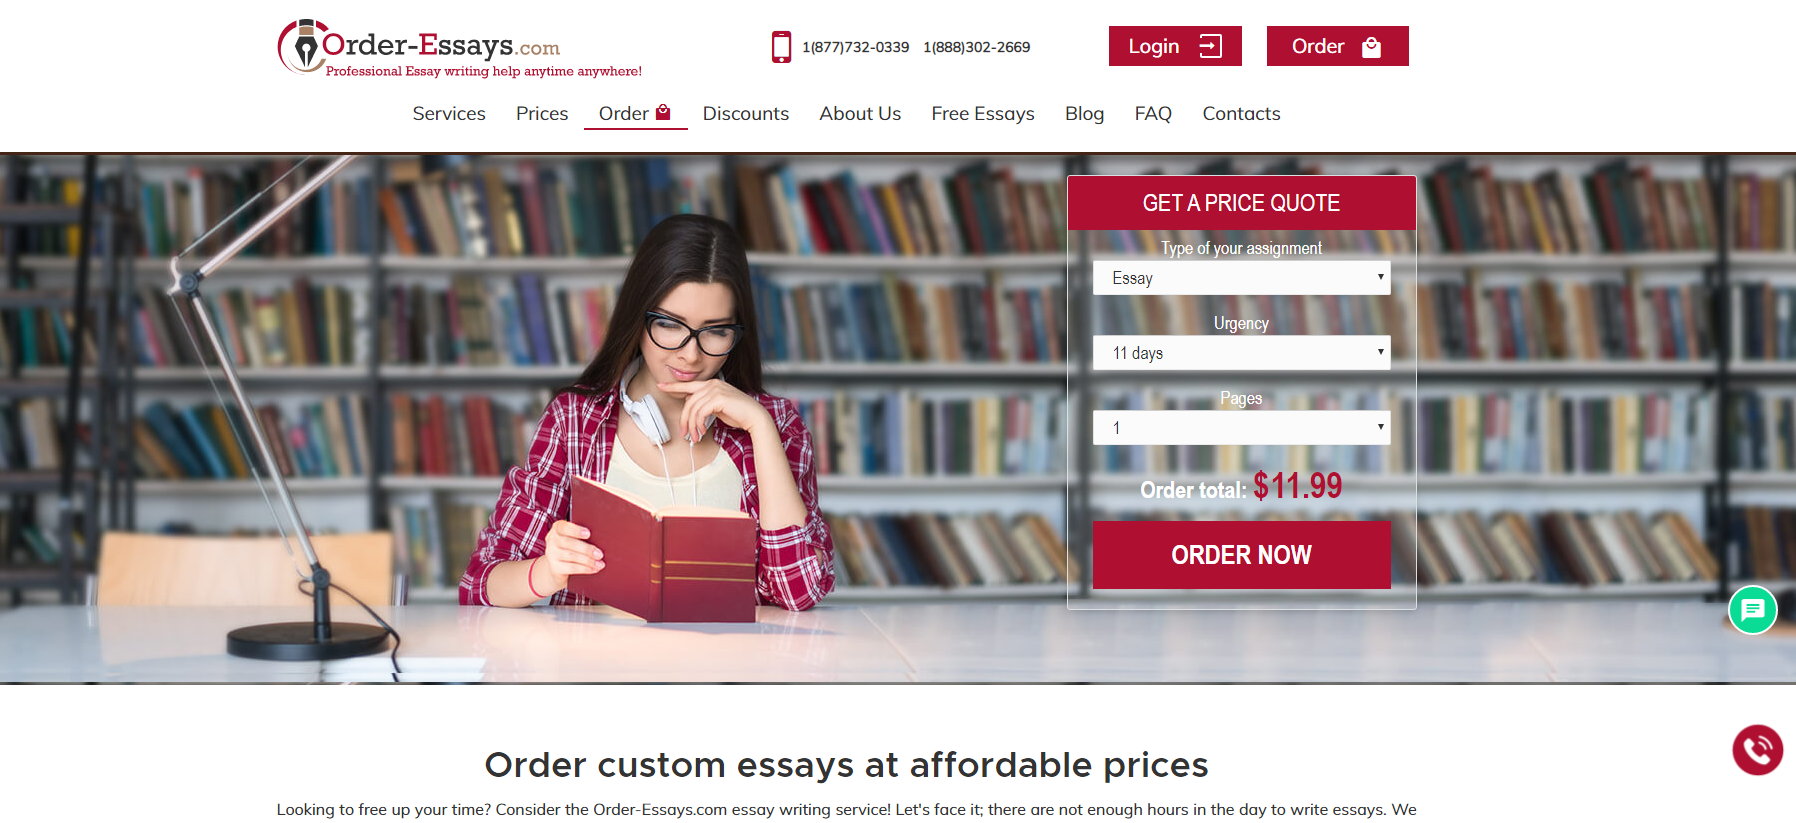 Order-Essays.com